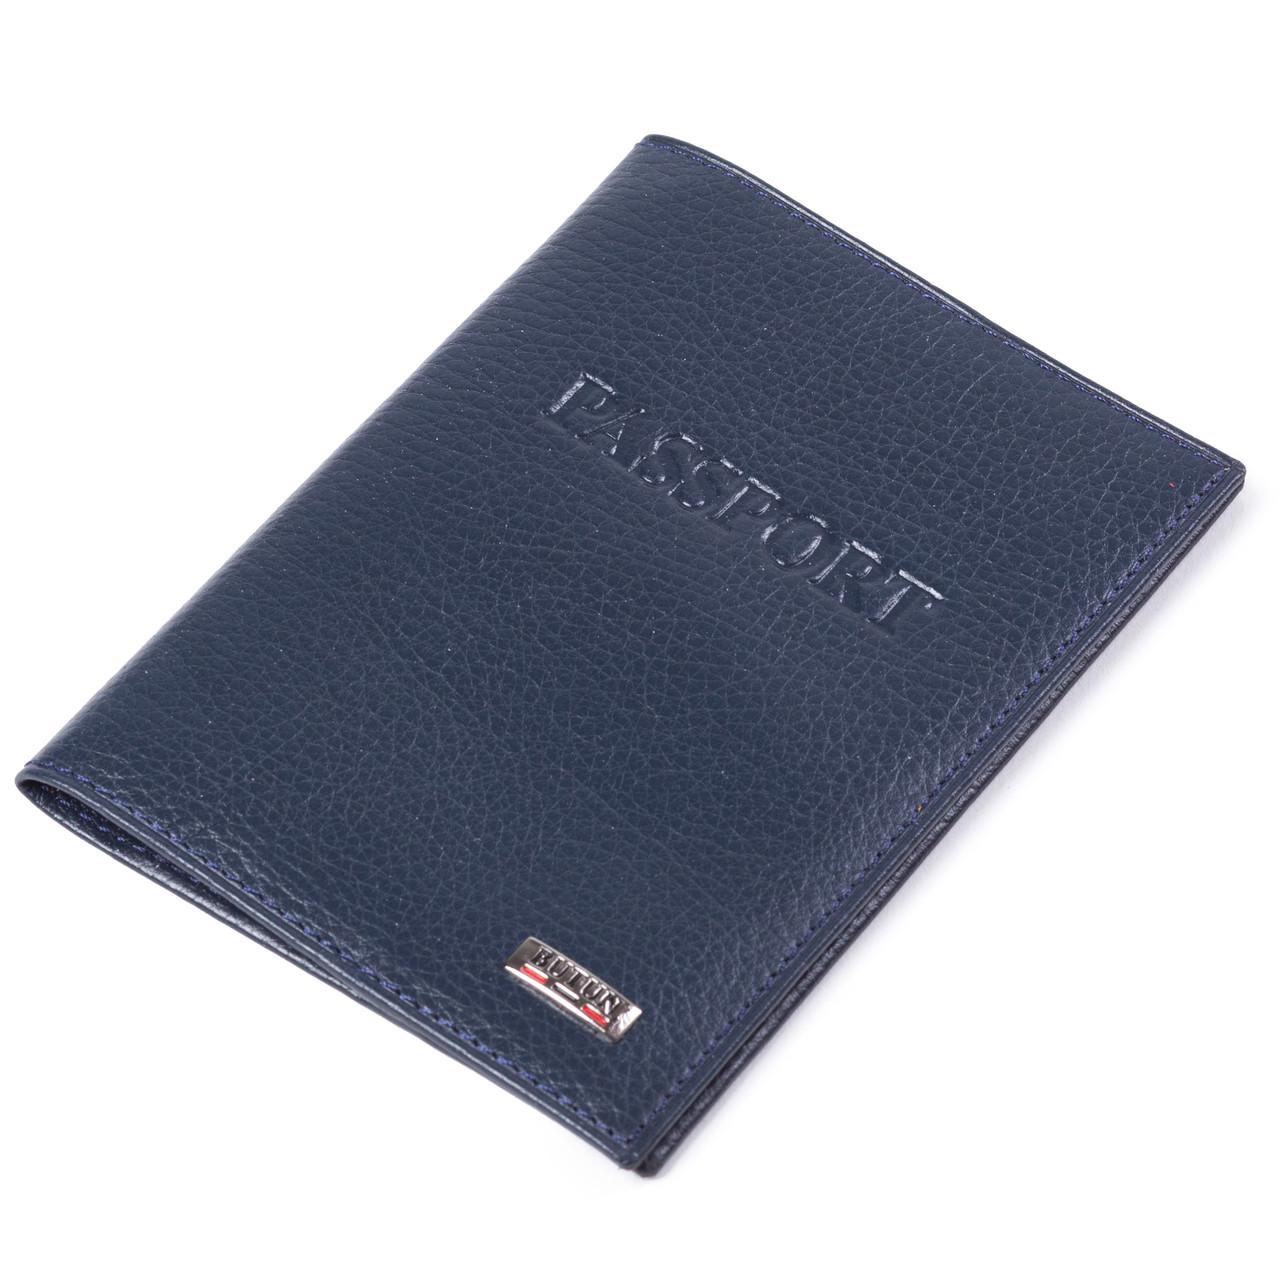 Кожаная обложка на паспорт синяя Butun 147-004-034